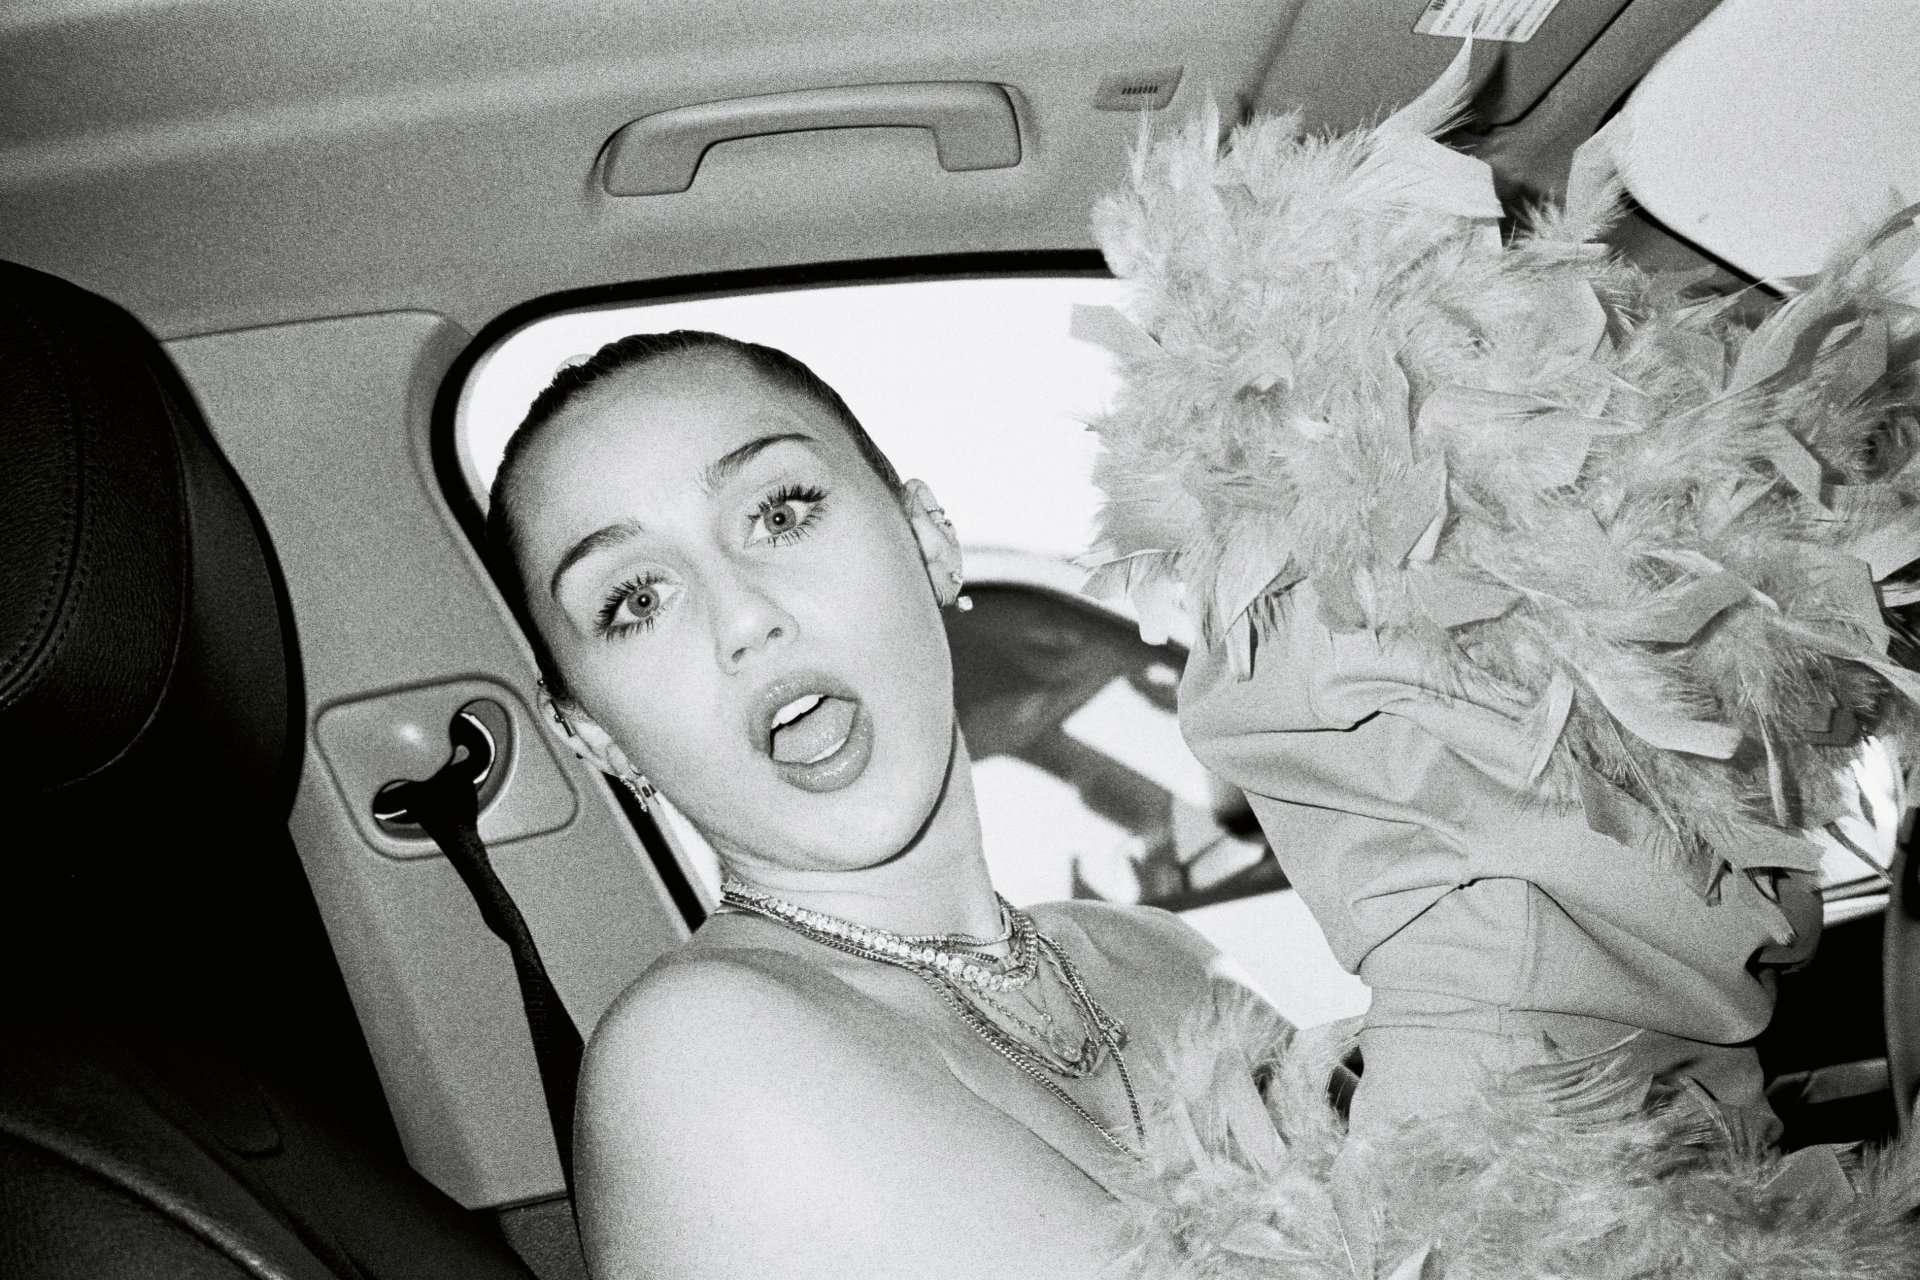 340253353_Miley_Cyrus_in_Bikini_Photoshoot_by_Alice_Moitie_2019_10_122_554lo.jpg